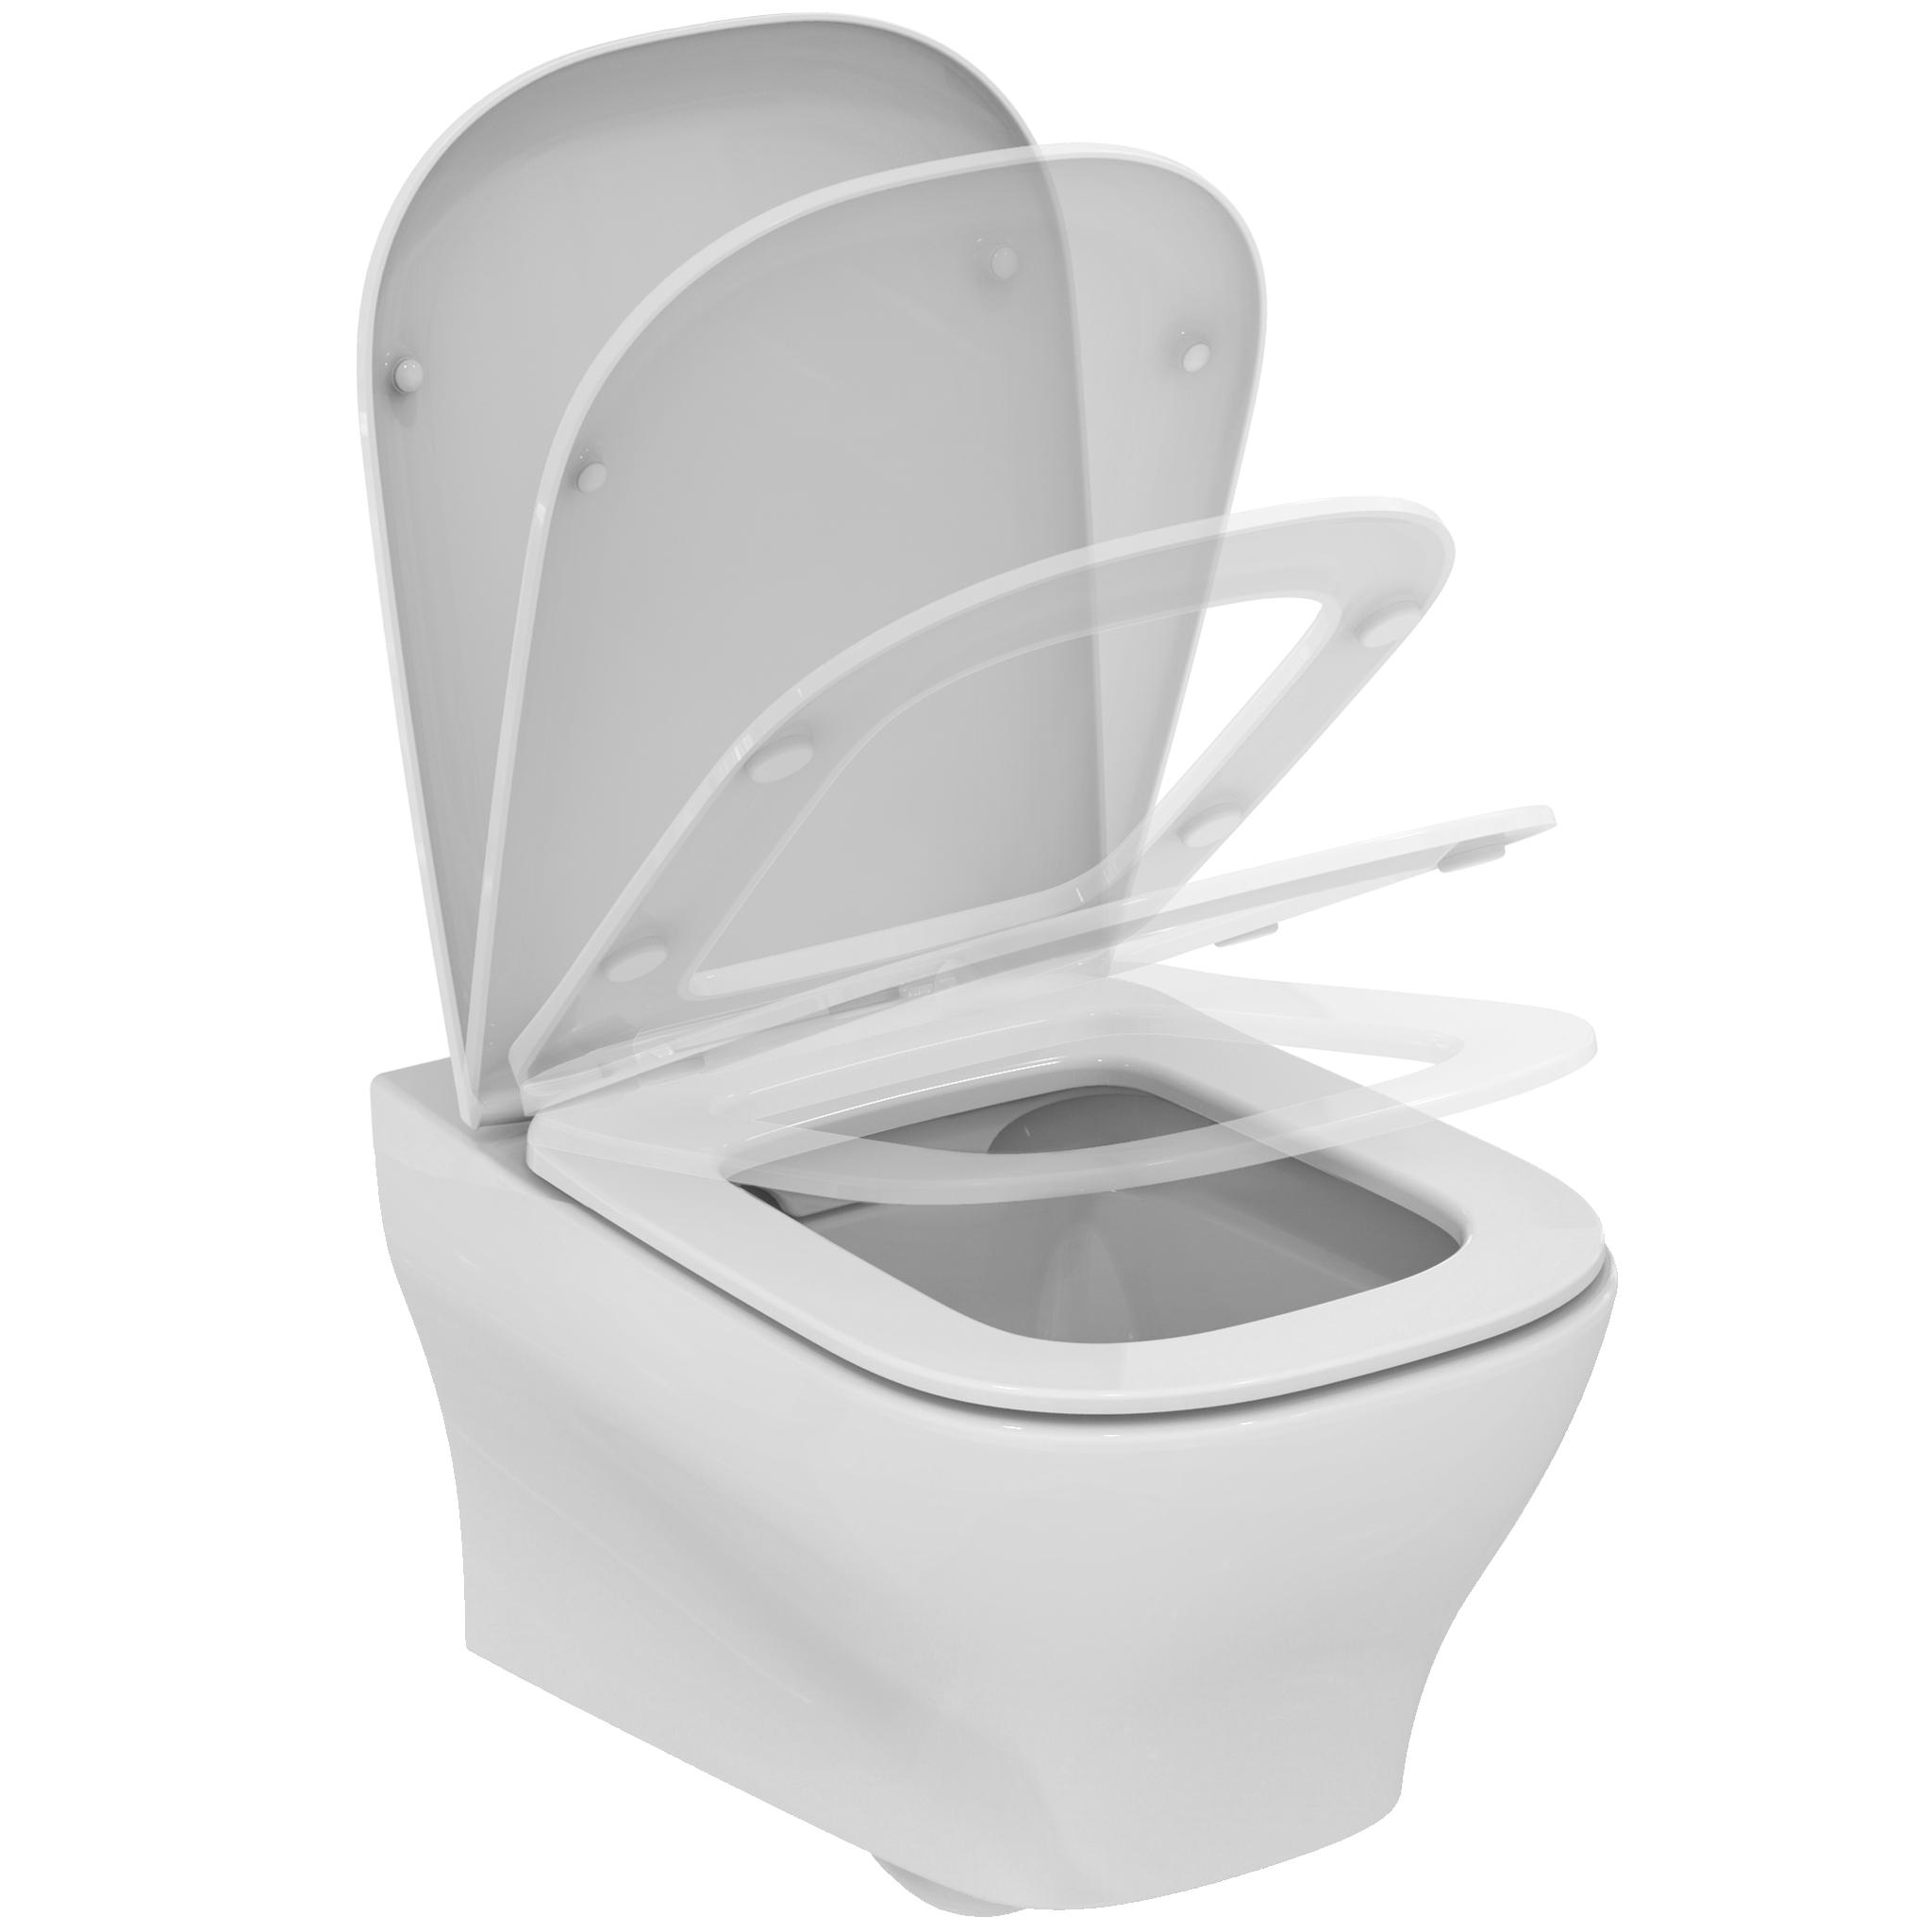 ensemble cuvette wc suspendue softmood sans bride abattant ultra fin frein de chute ideal. Black Bedroom Furniture Sets. Home Design Ideas